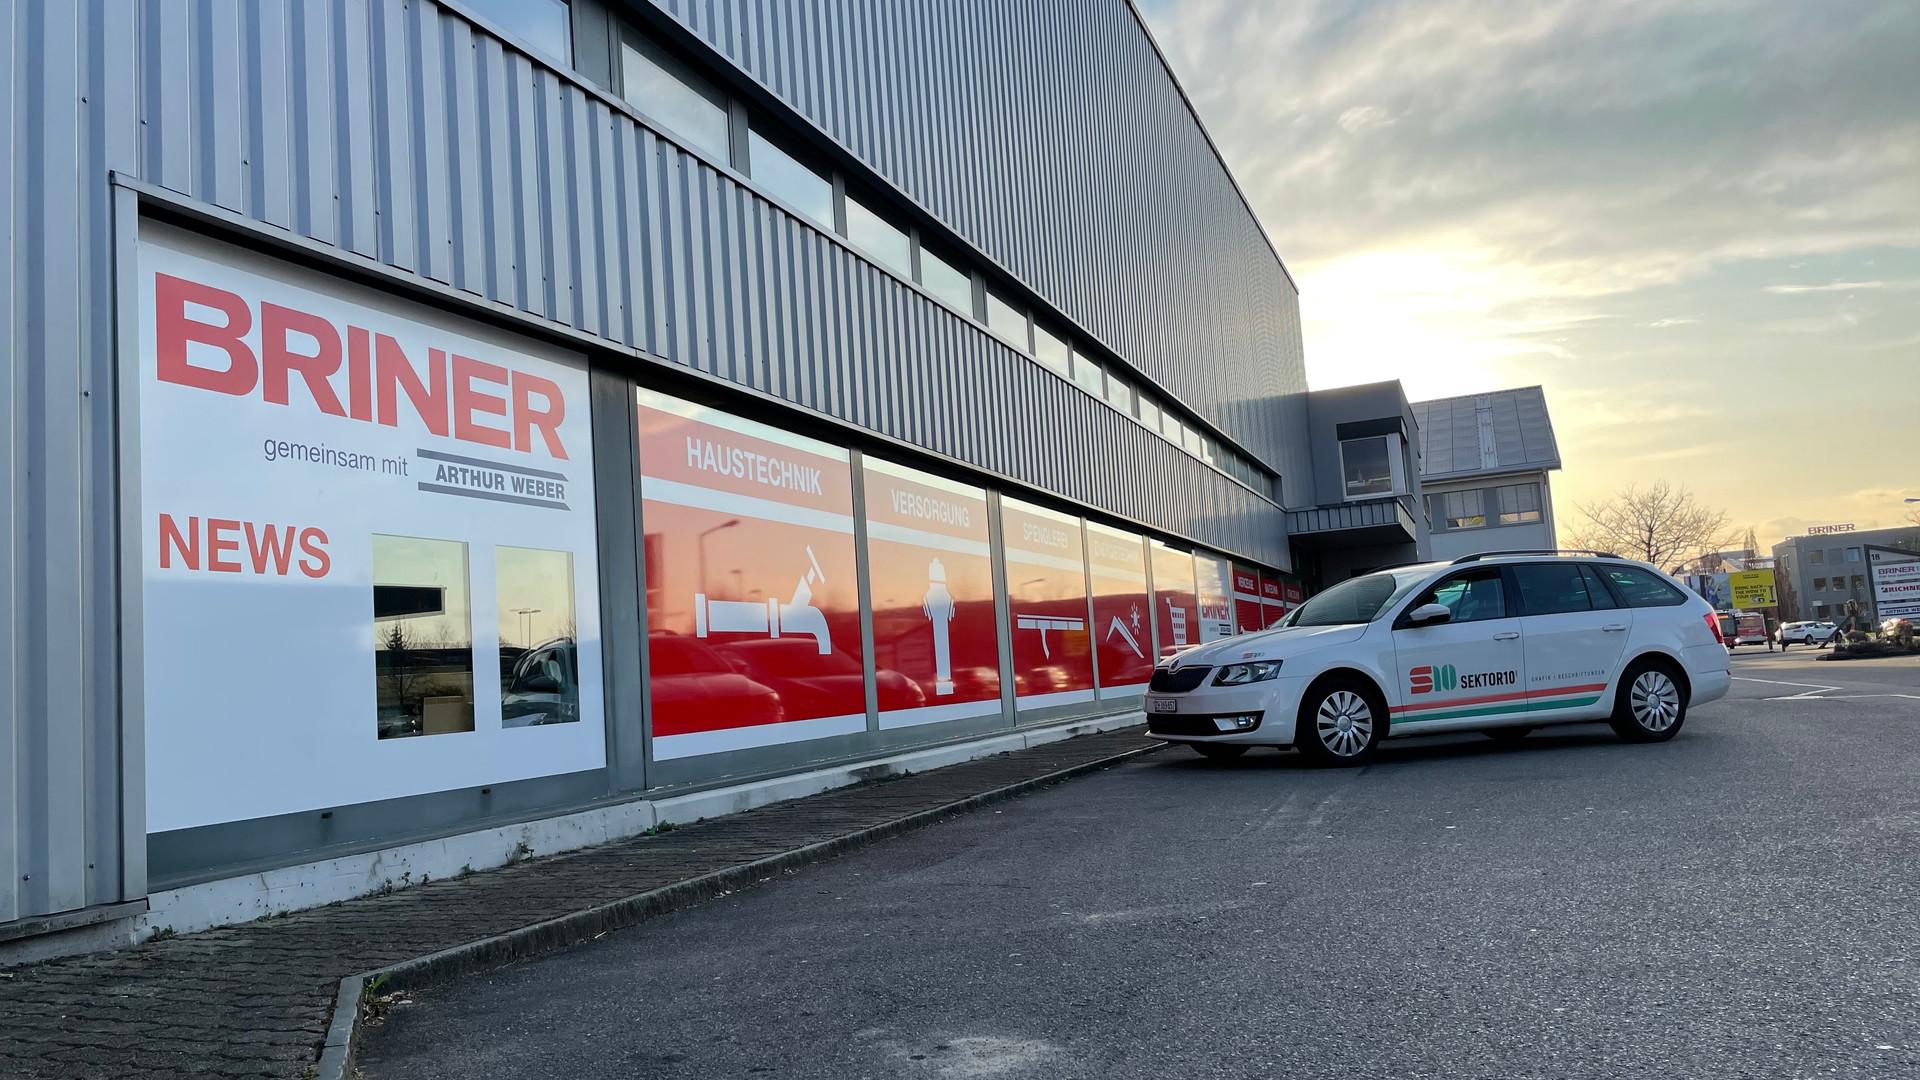 Schaufenster Beschriftung Briner, Winterthur